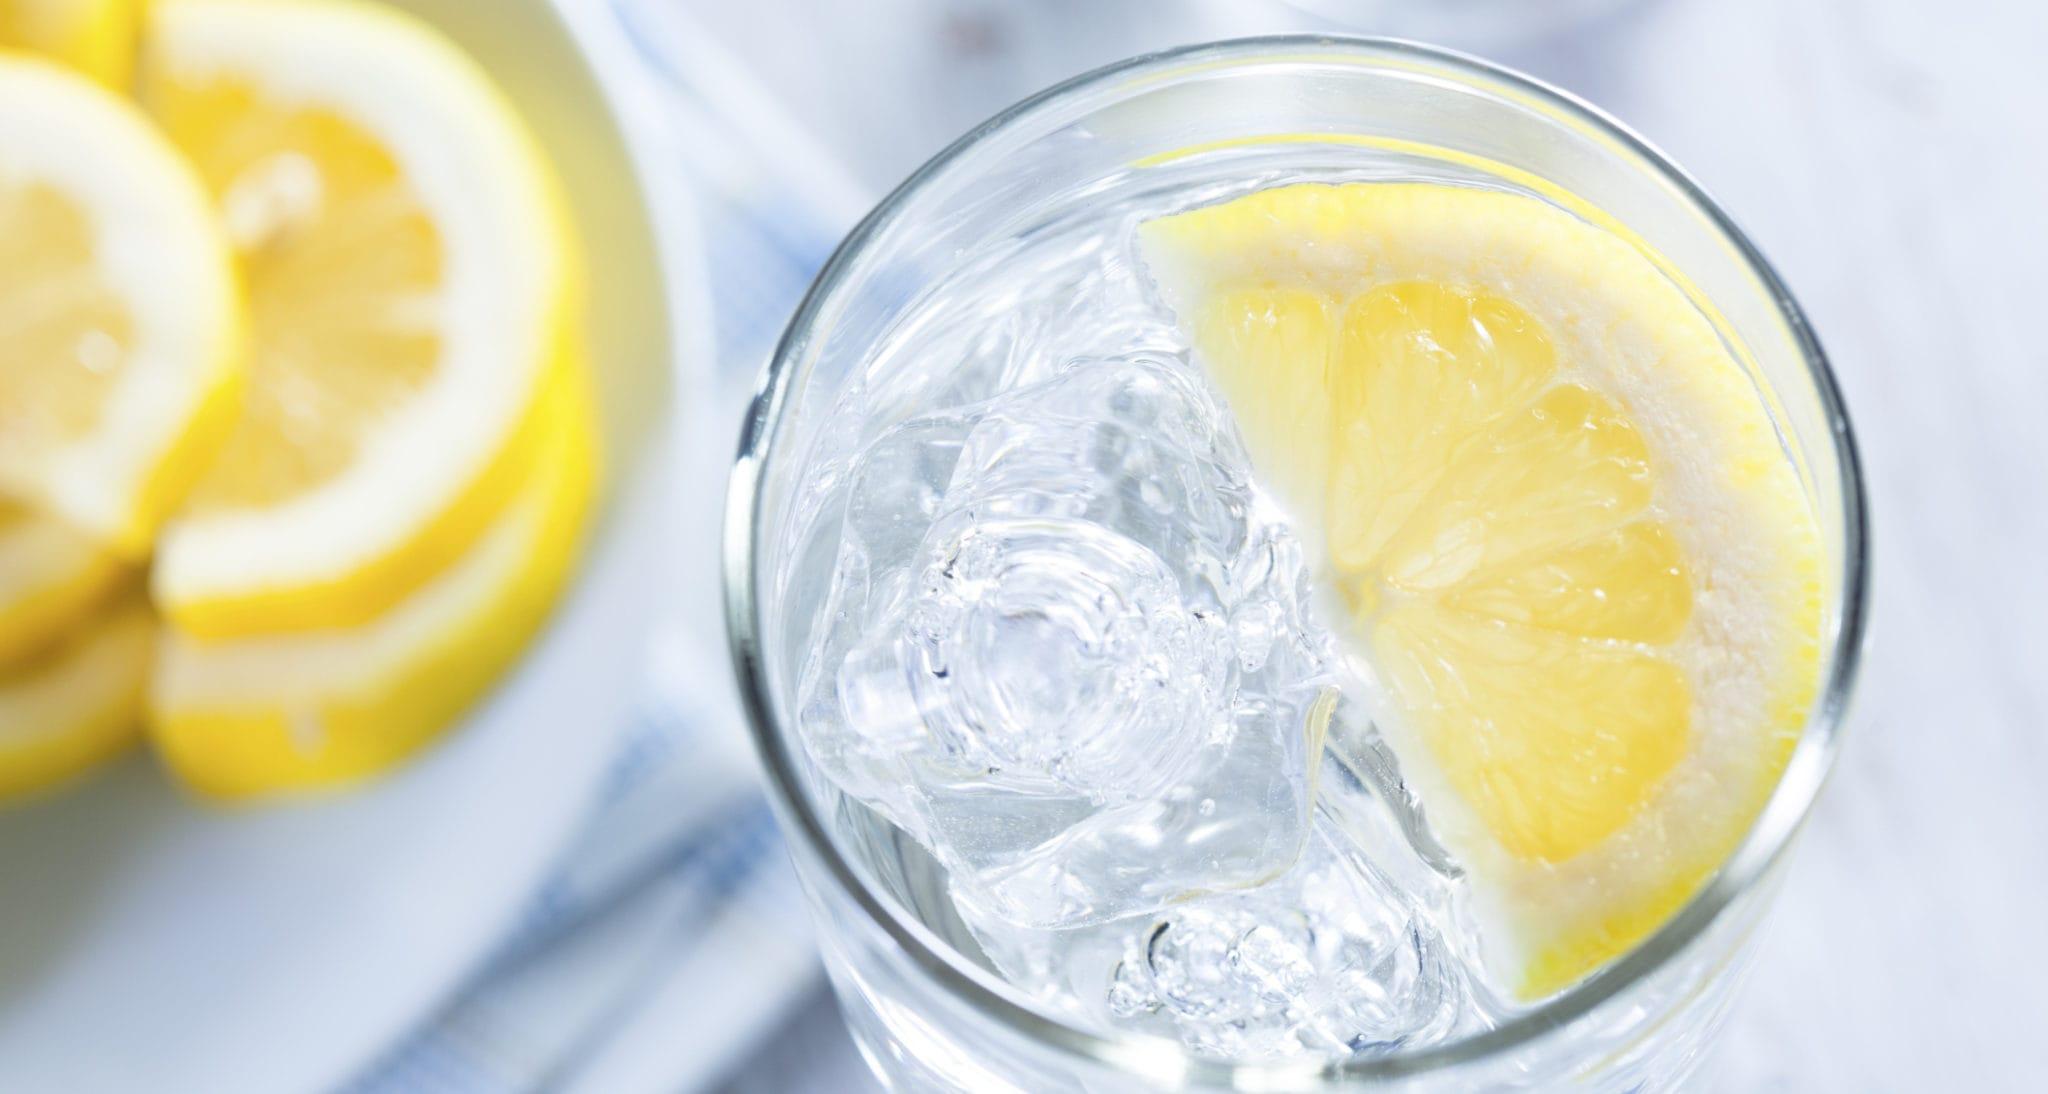 refreshed waking up lemon water sleeping better feng shui